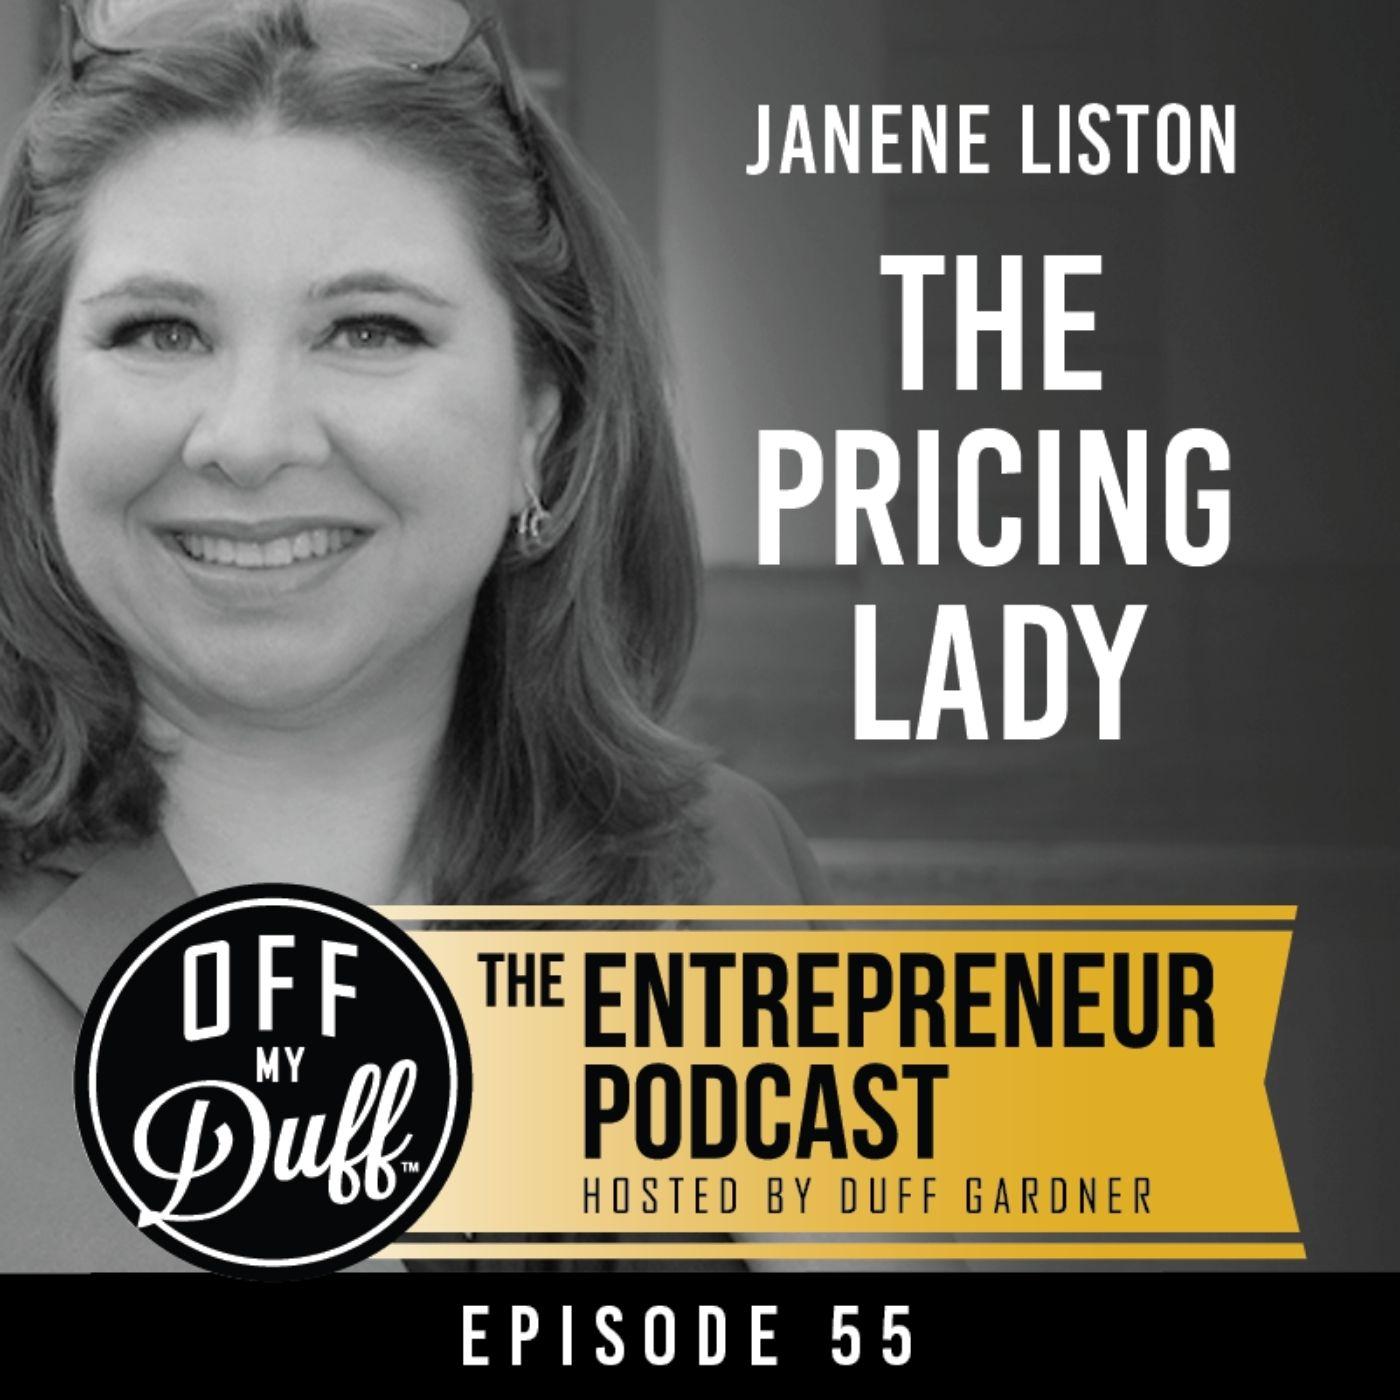 Janene Liston – The Pricing Lady